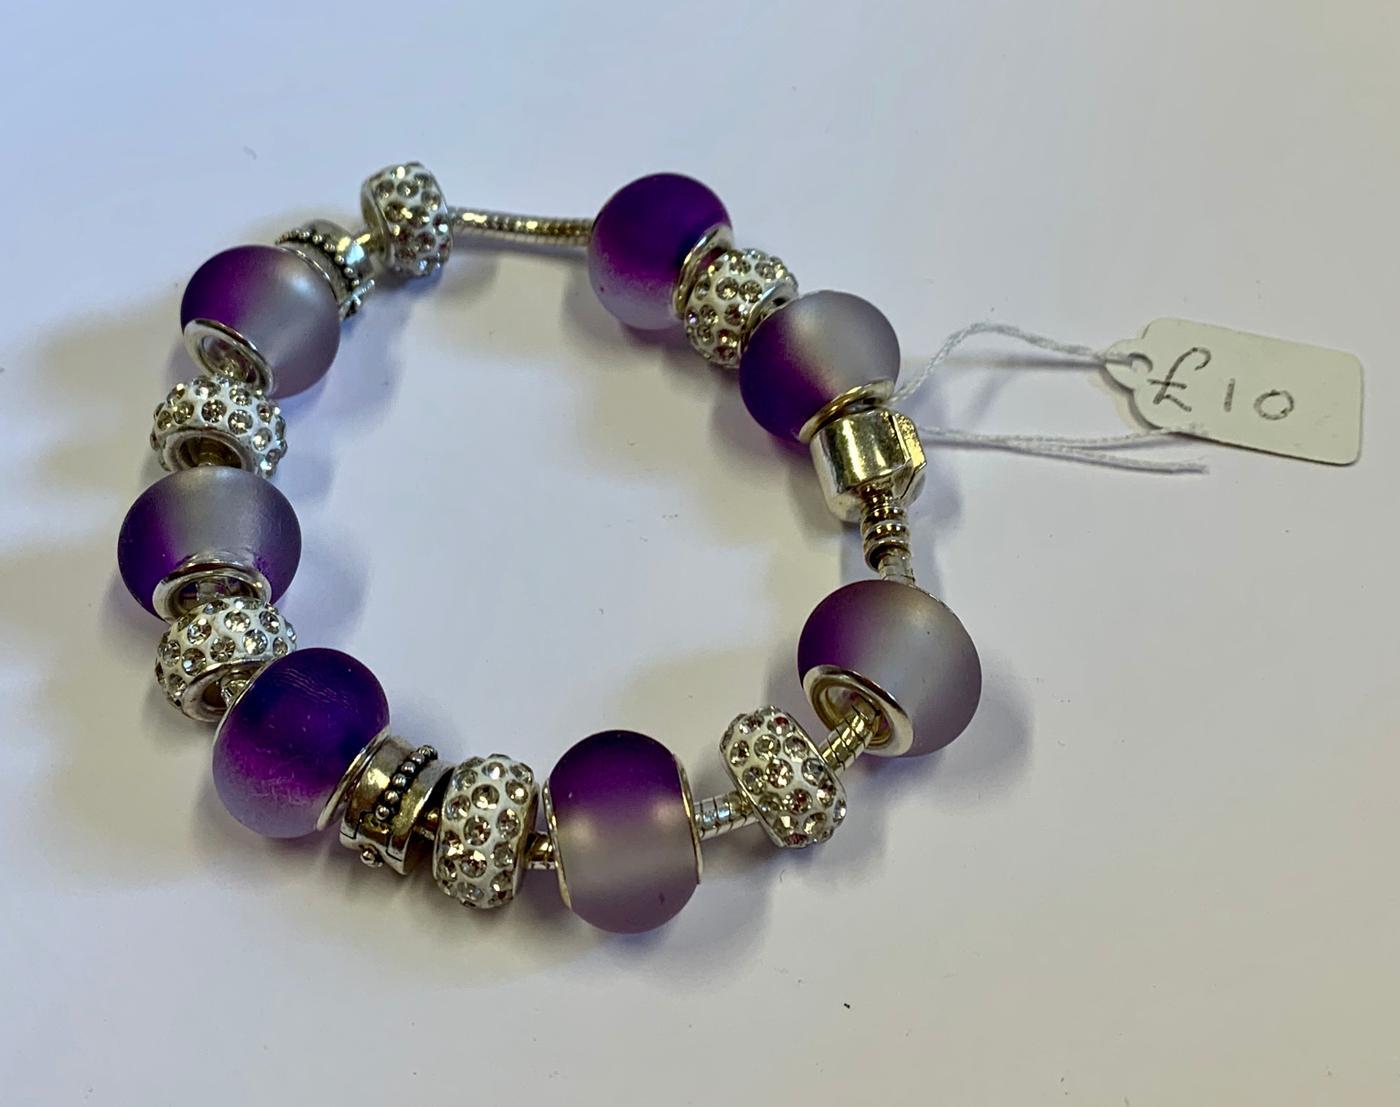 Kerry's Crafts Murano Glass Bead Bracelet